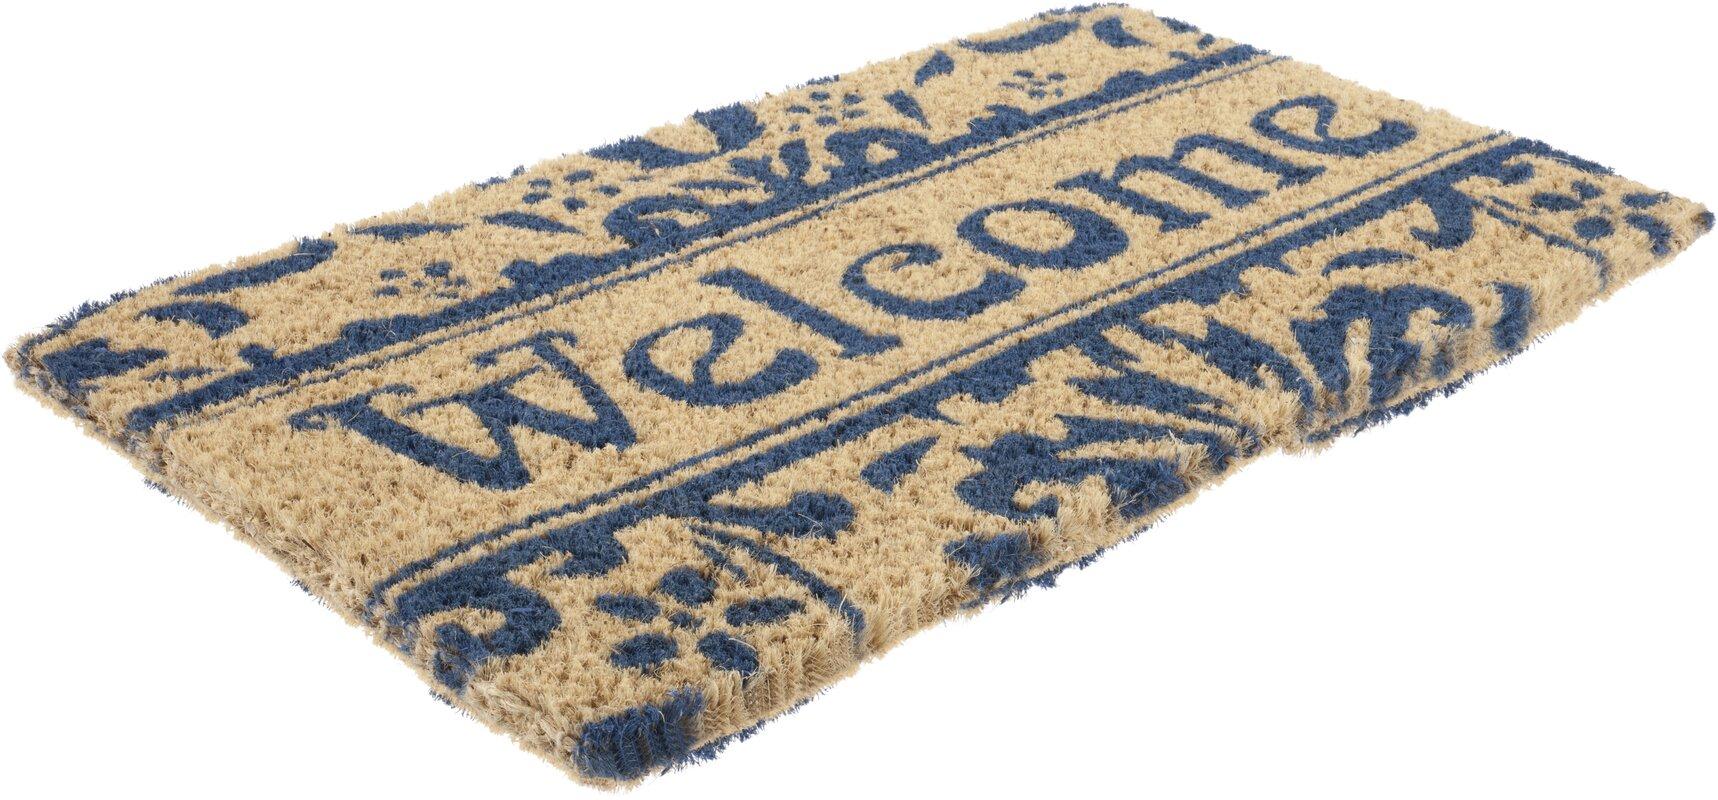 Damask Welcome Doormat & Reviews   Birch Lane